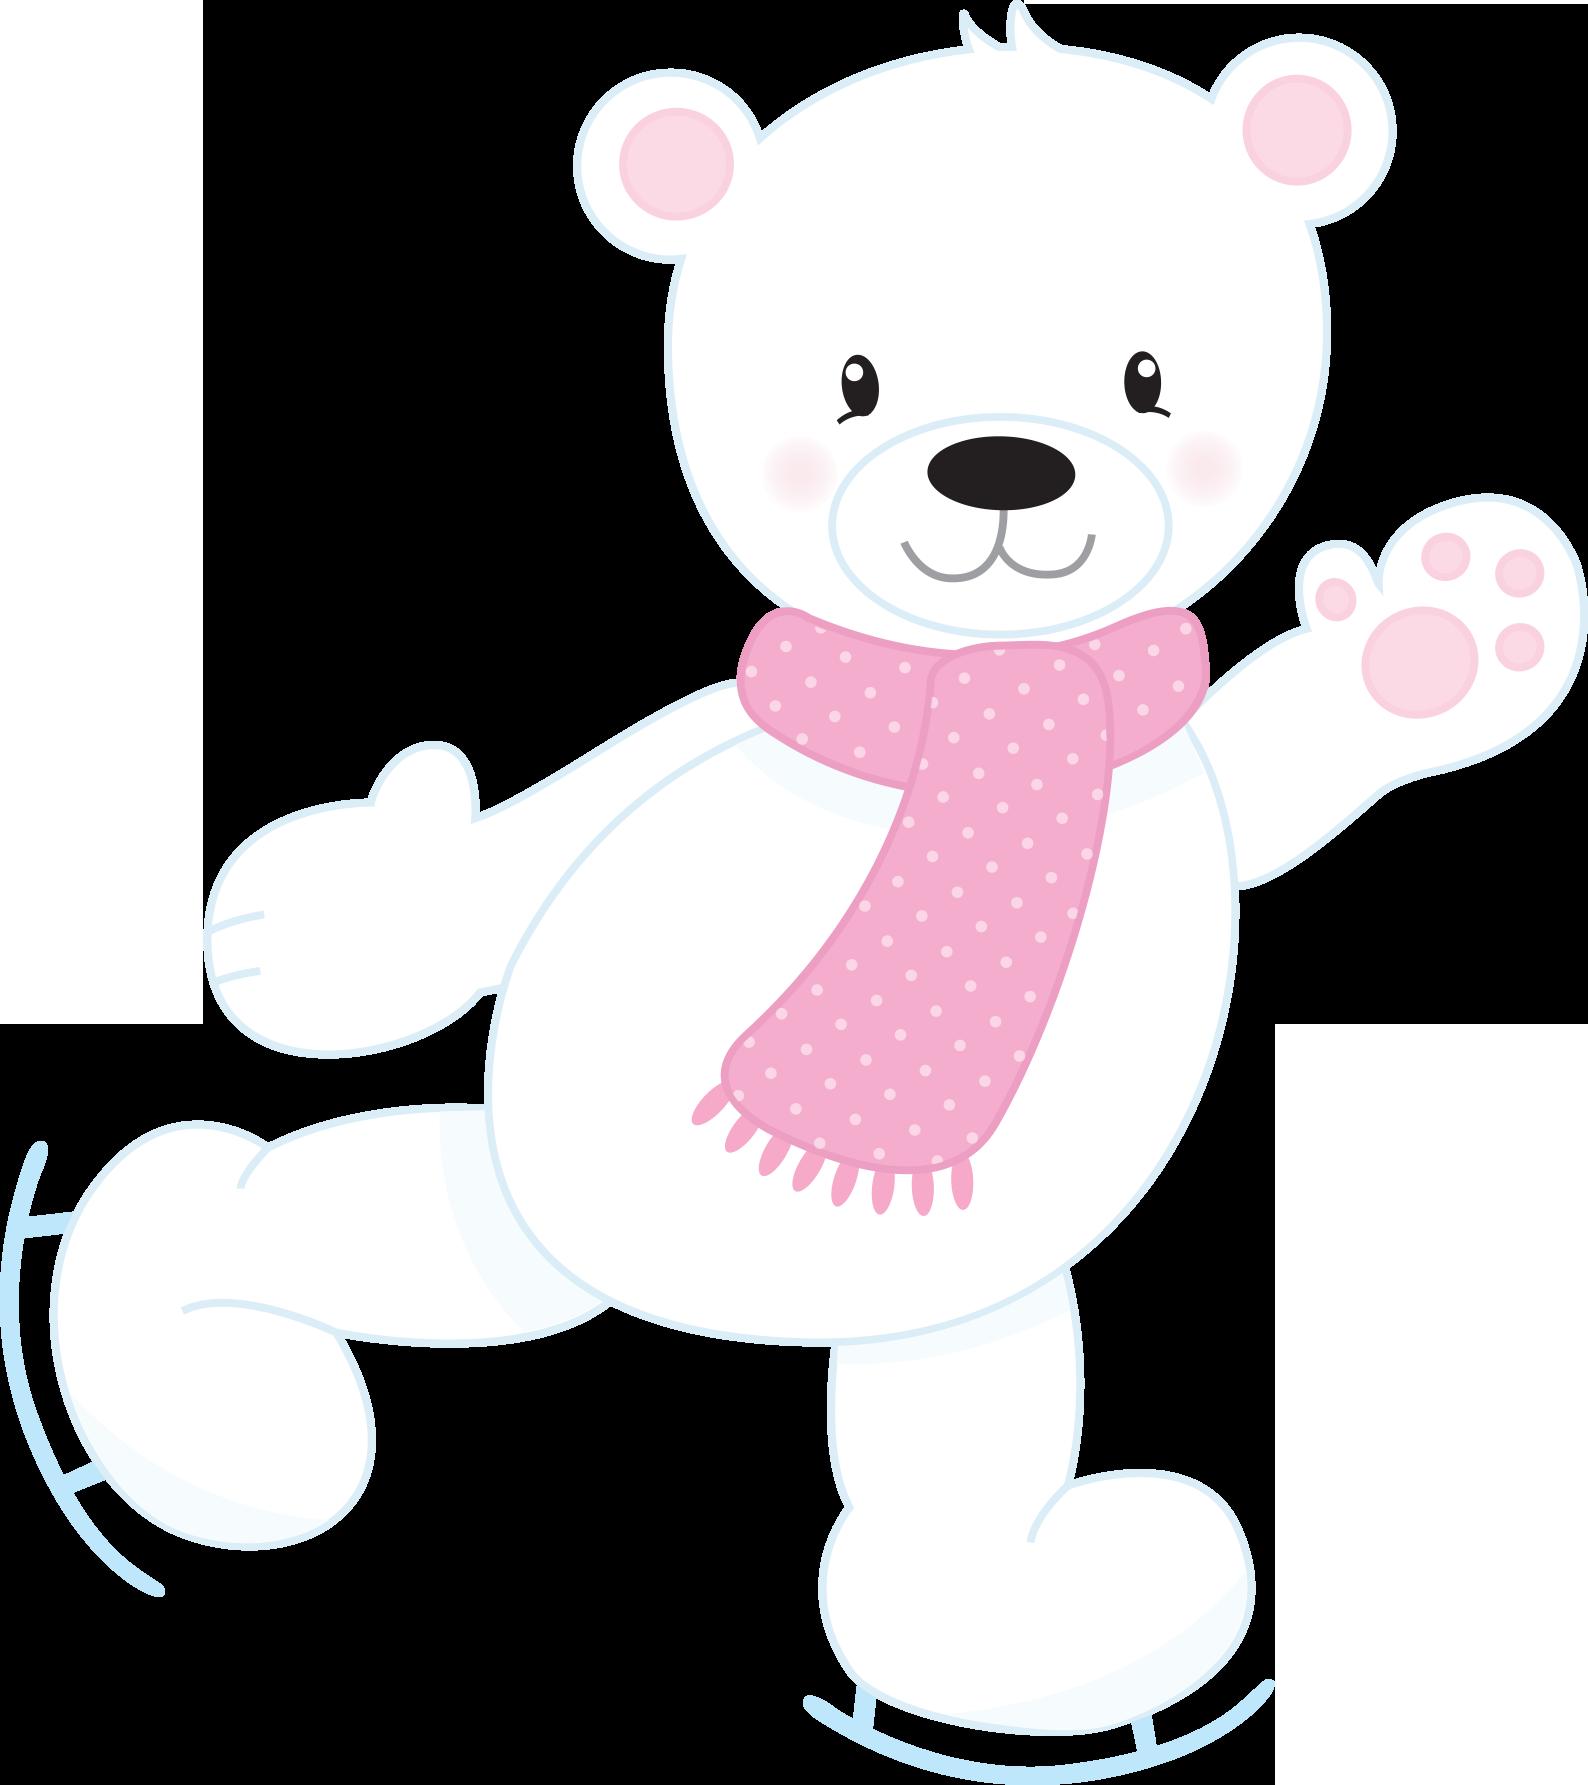 Holiday clipart polar bear. Ibq lwp mxcpsu png